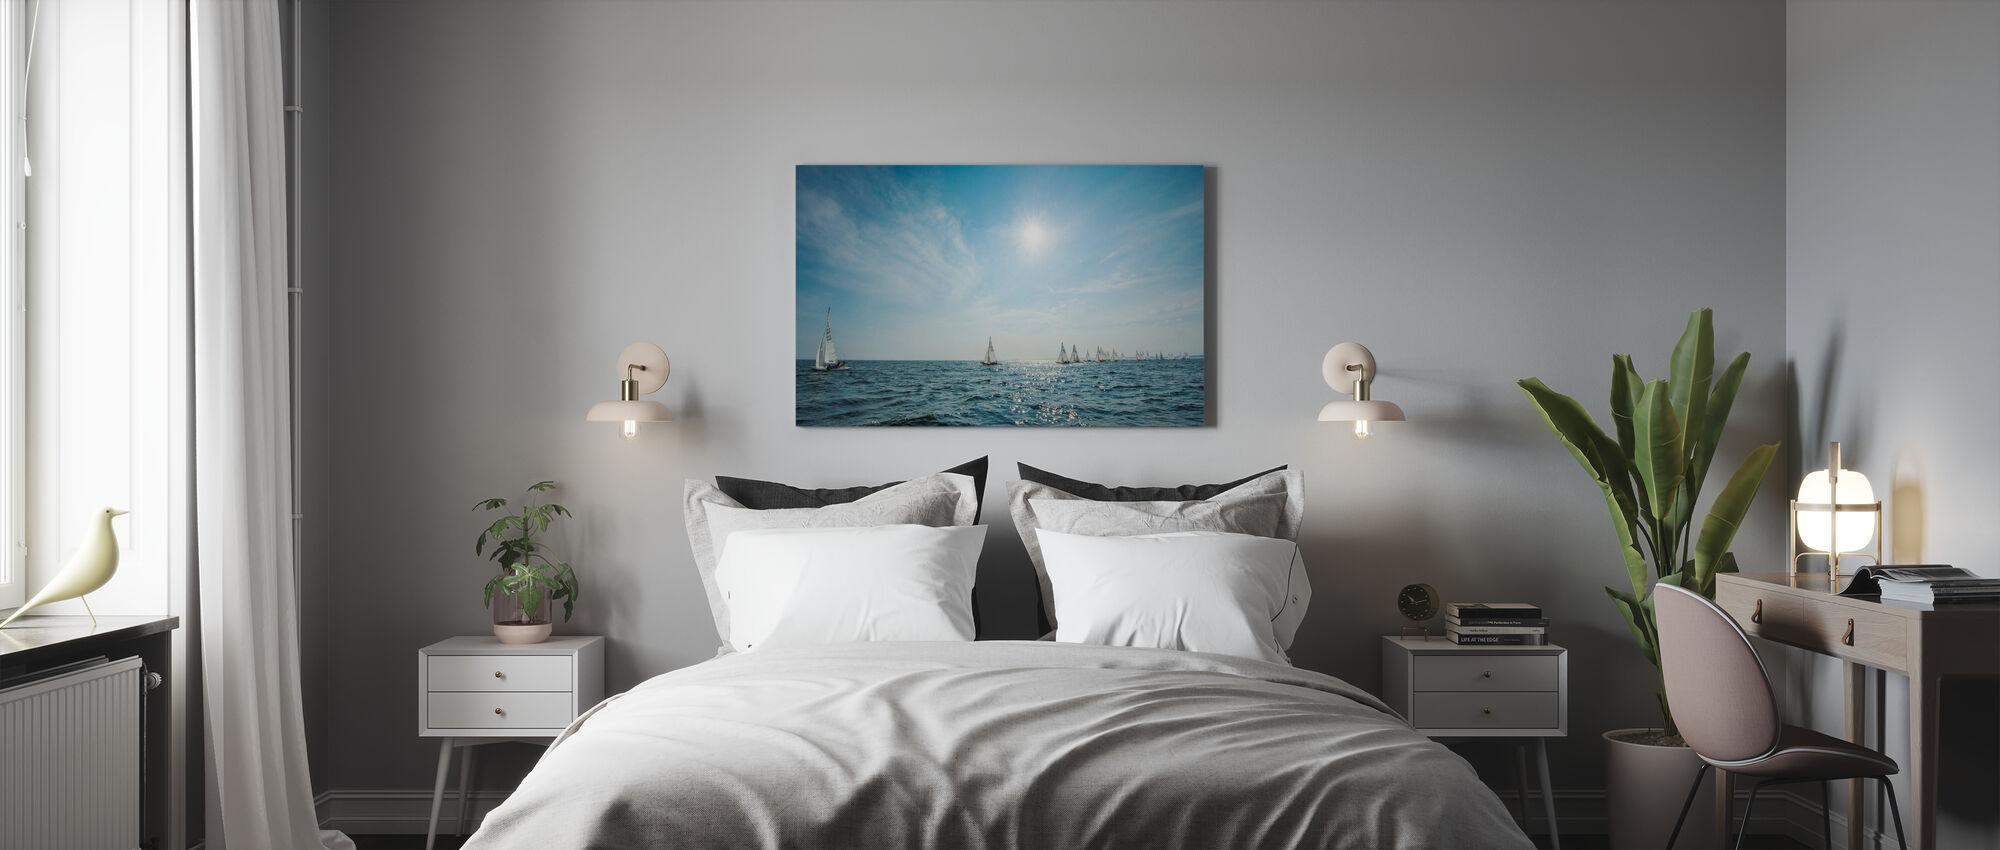 The Archipleago of Nynashamn, Sweden - Canvas print - Bedroom